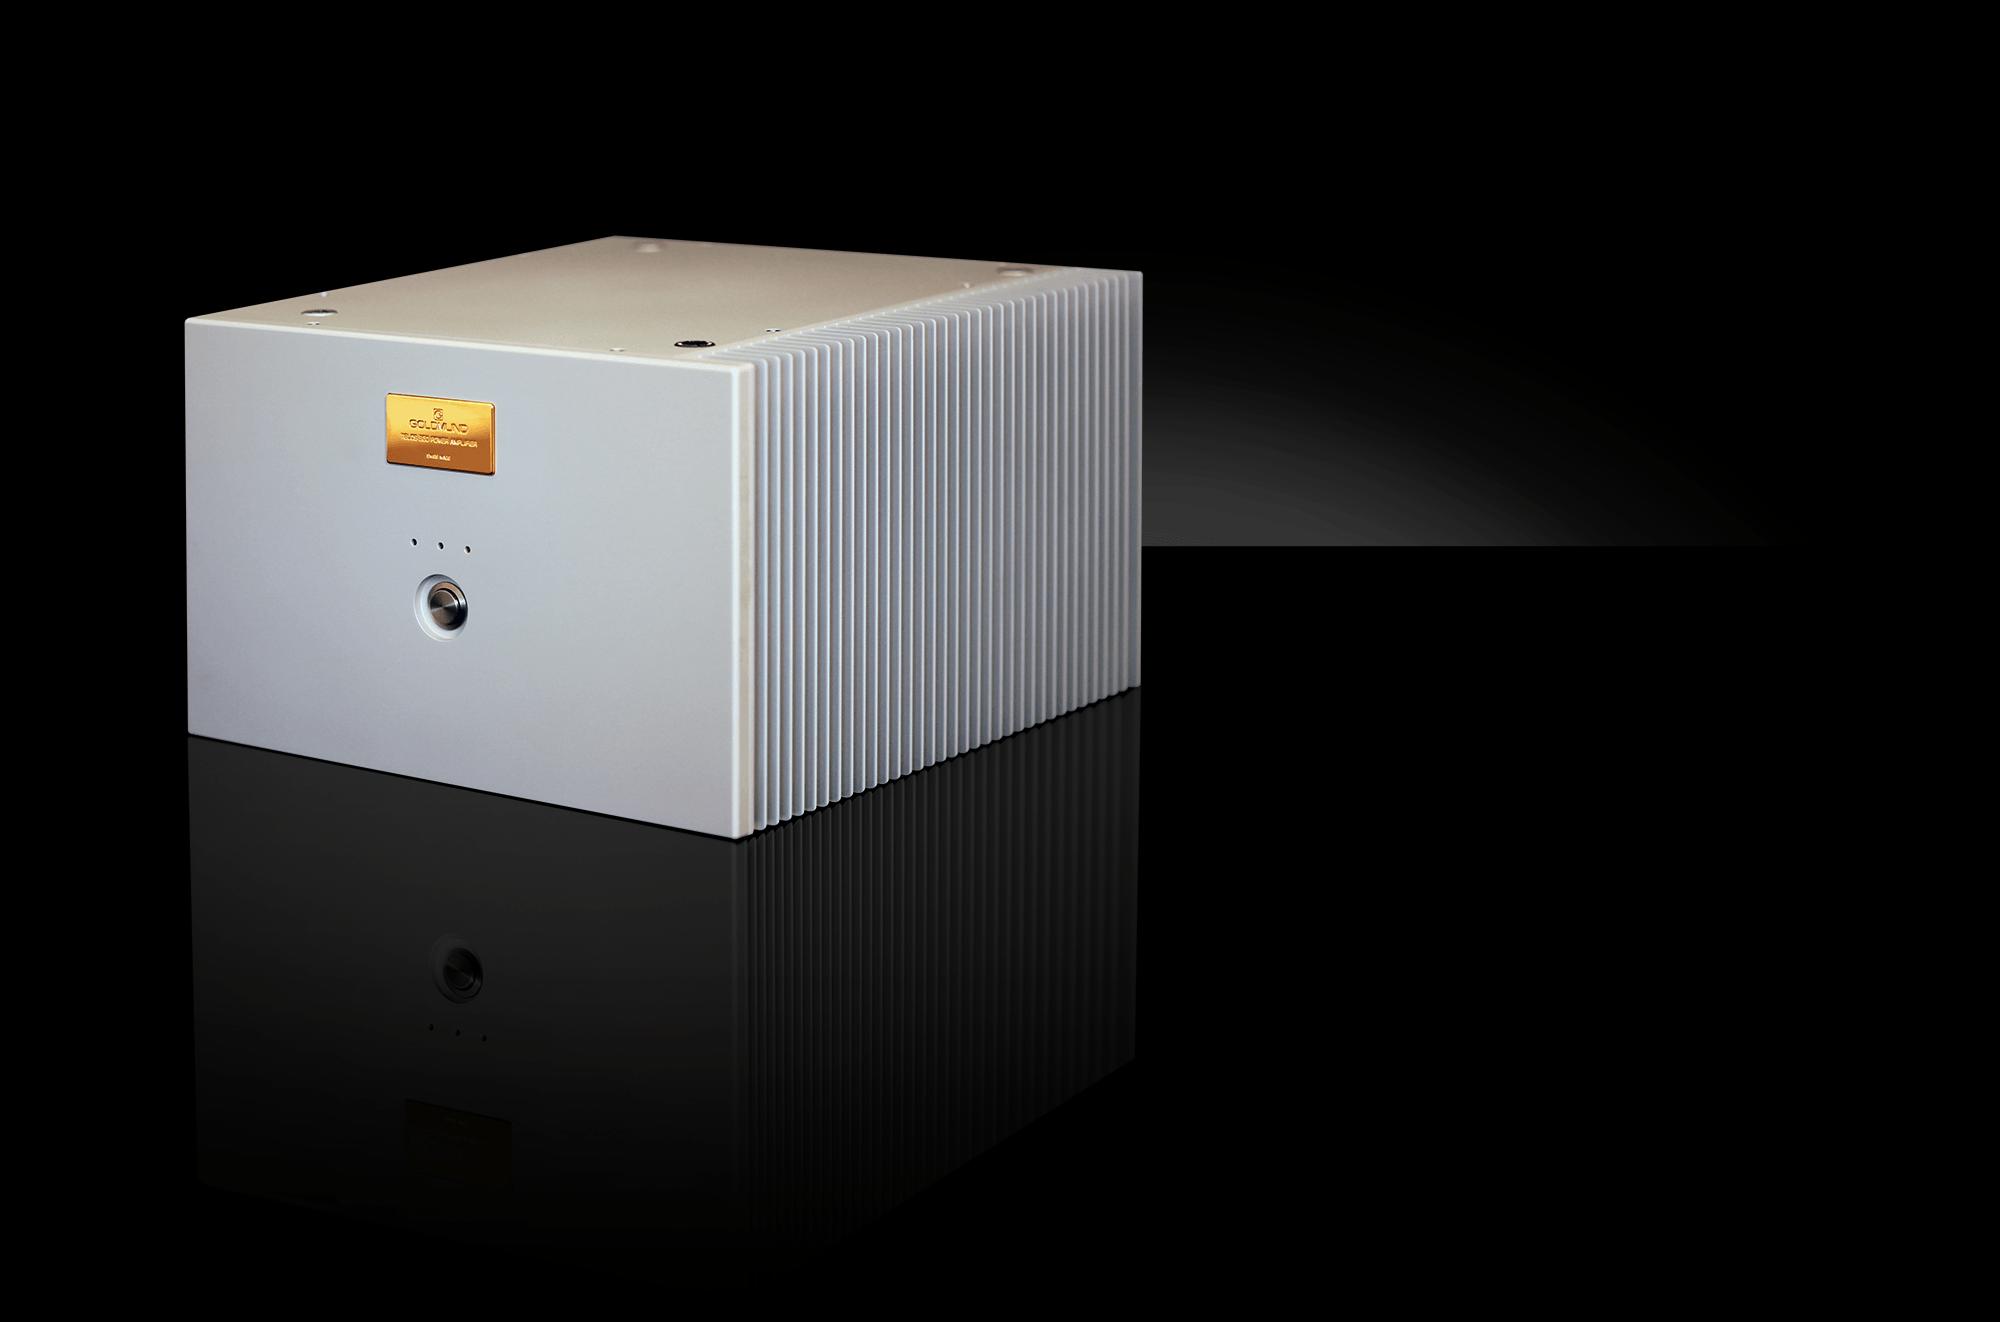 Telos 380 amplifier